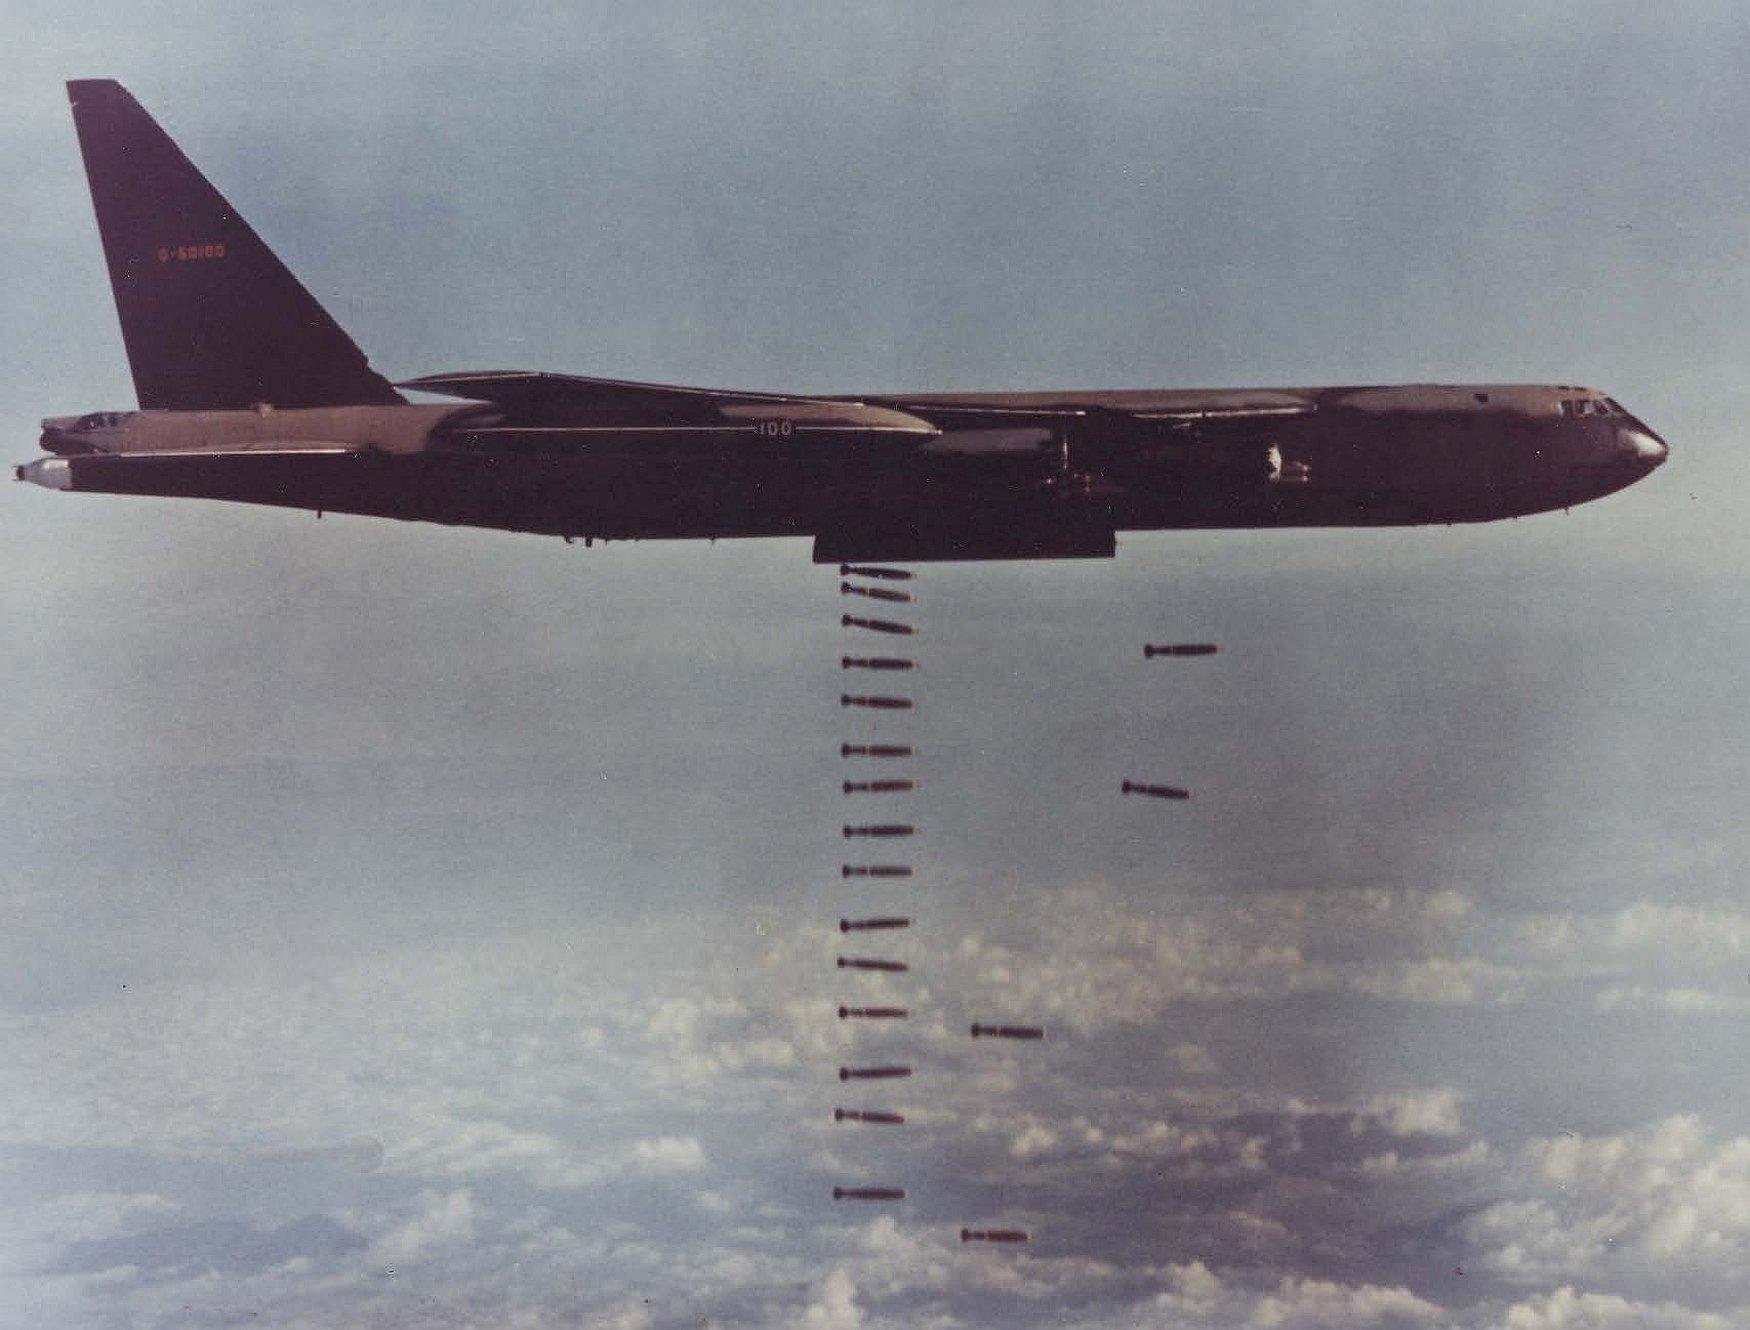 B52 Dropping Lots amp Lots of Bombs  Carpet Bombing